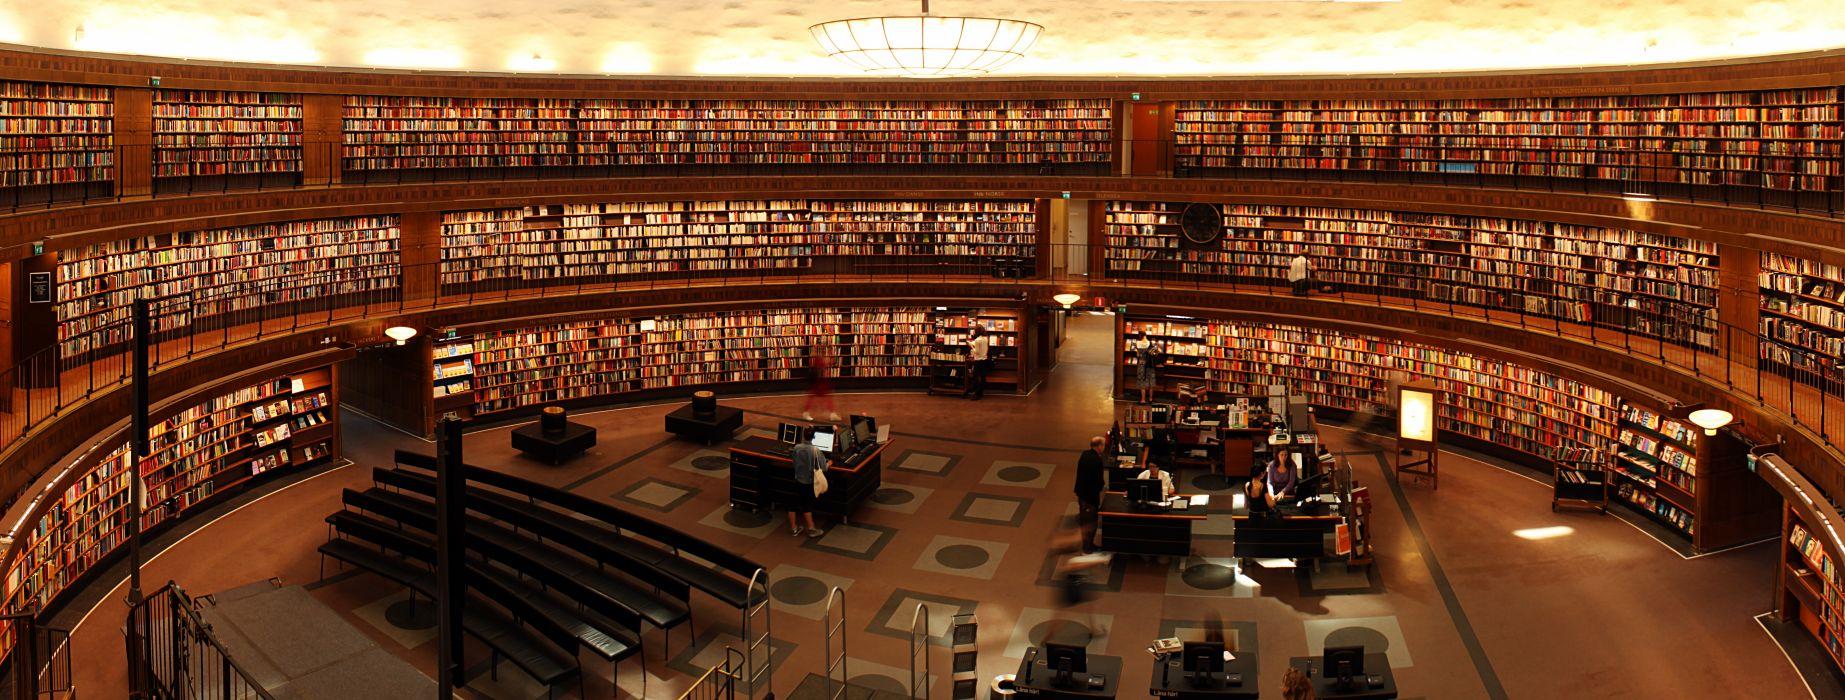 books library students study university wallpaper